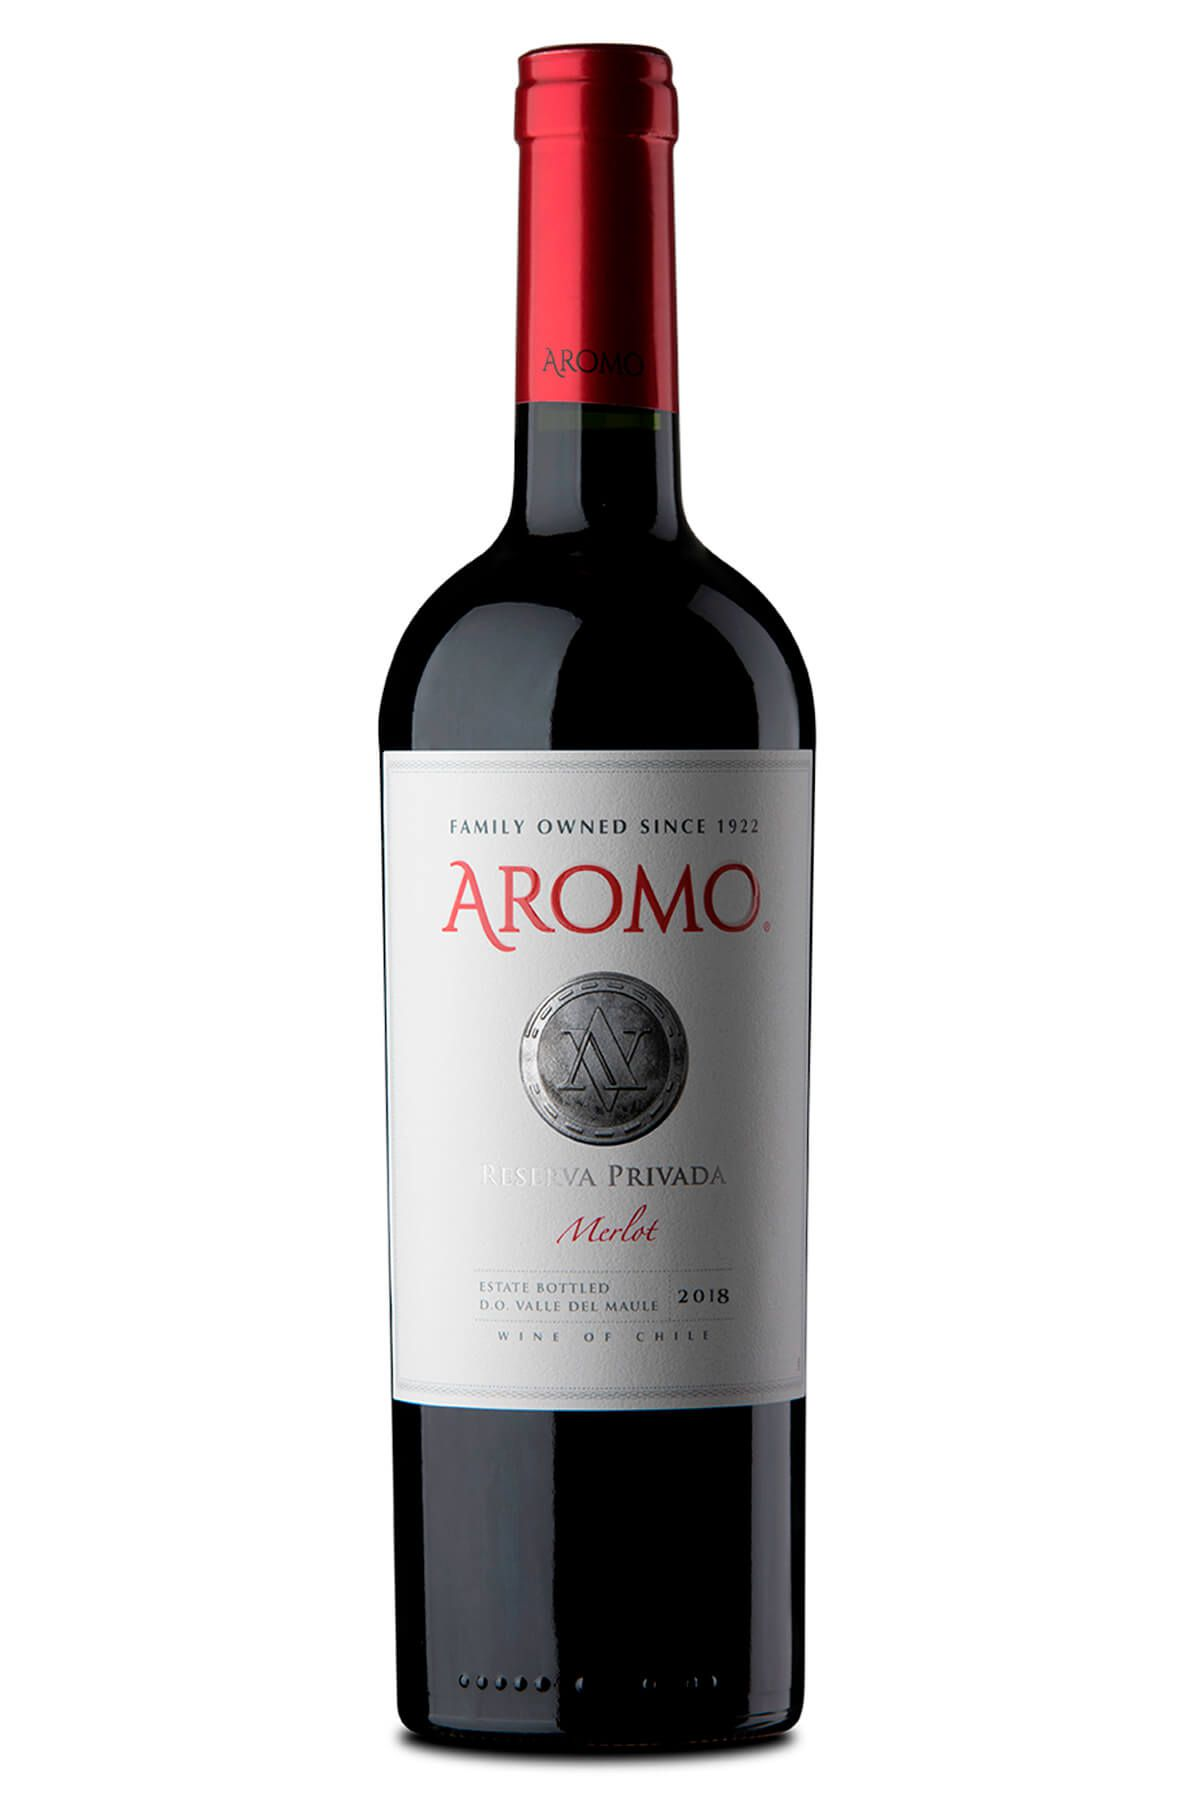 Vinho Tinto Aromo Reserva Privada Merlot 2018